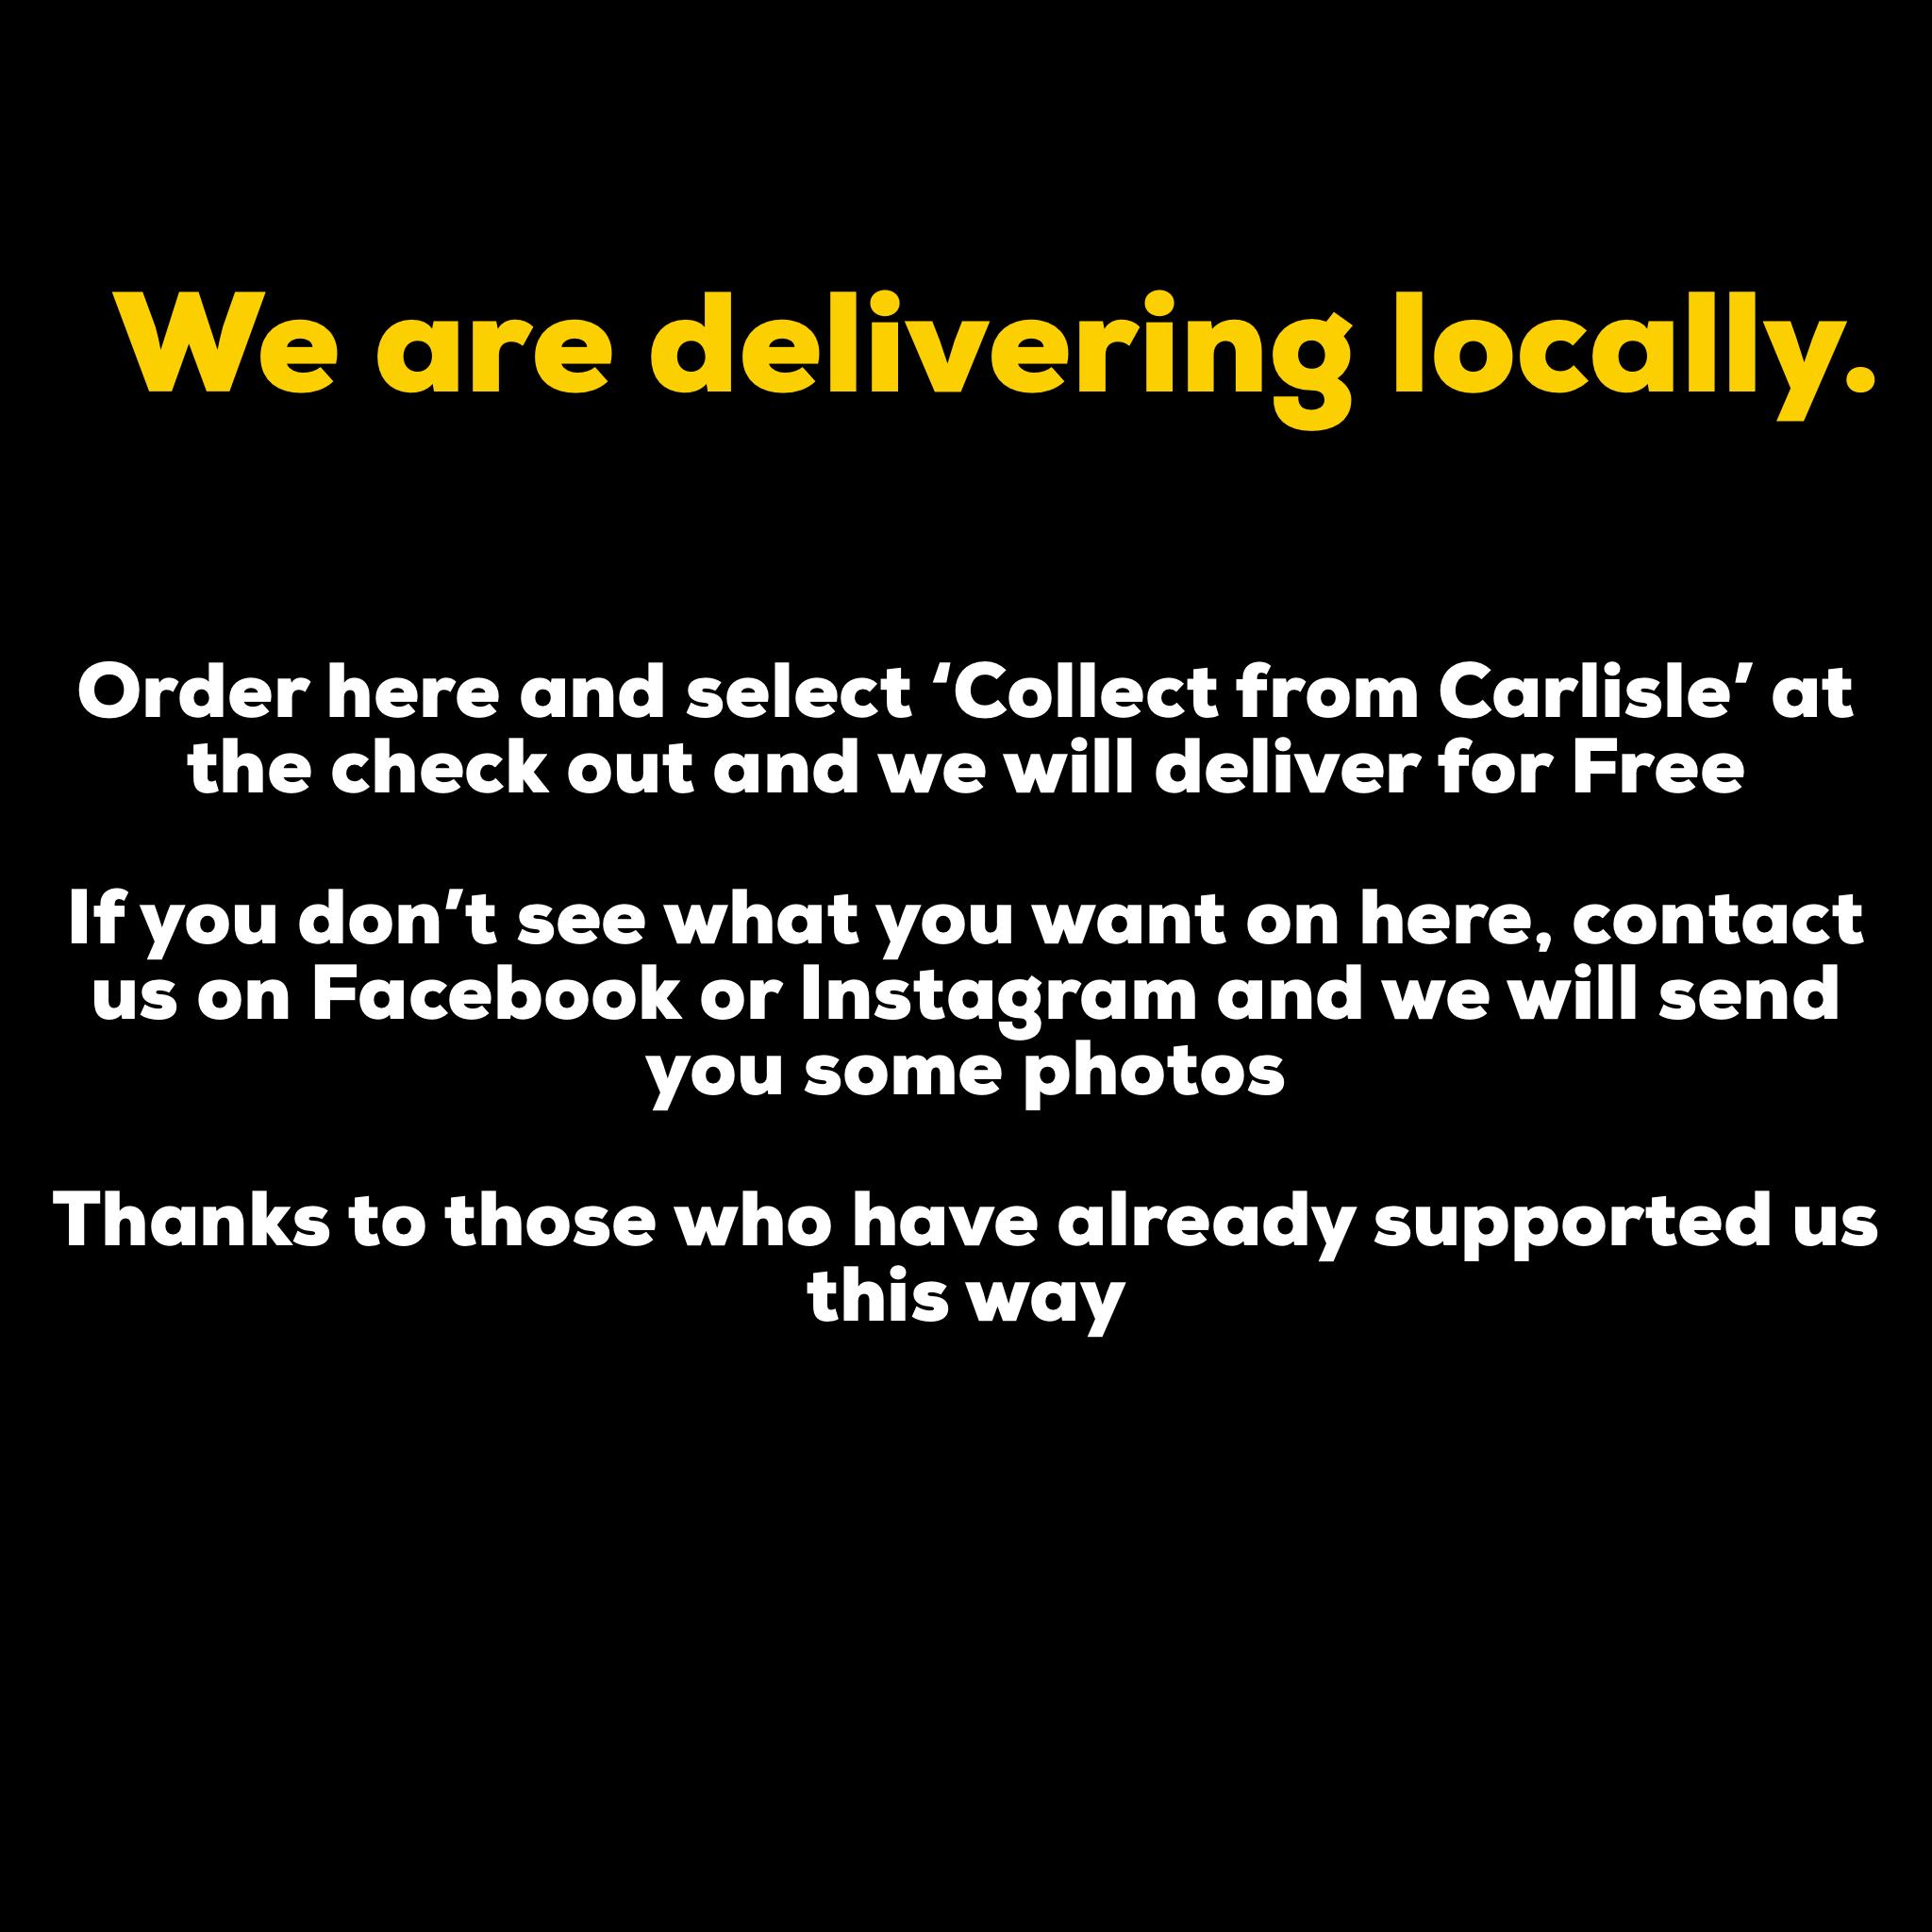 Covid19 Delivery